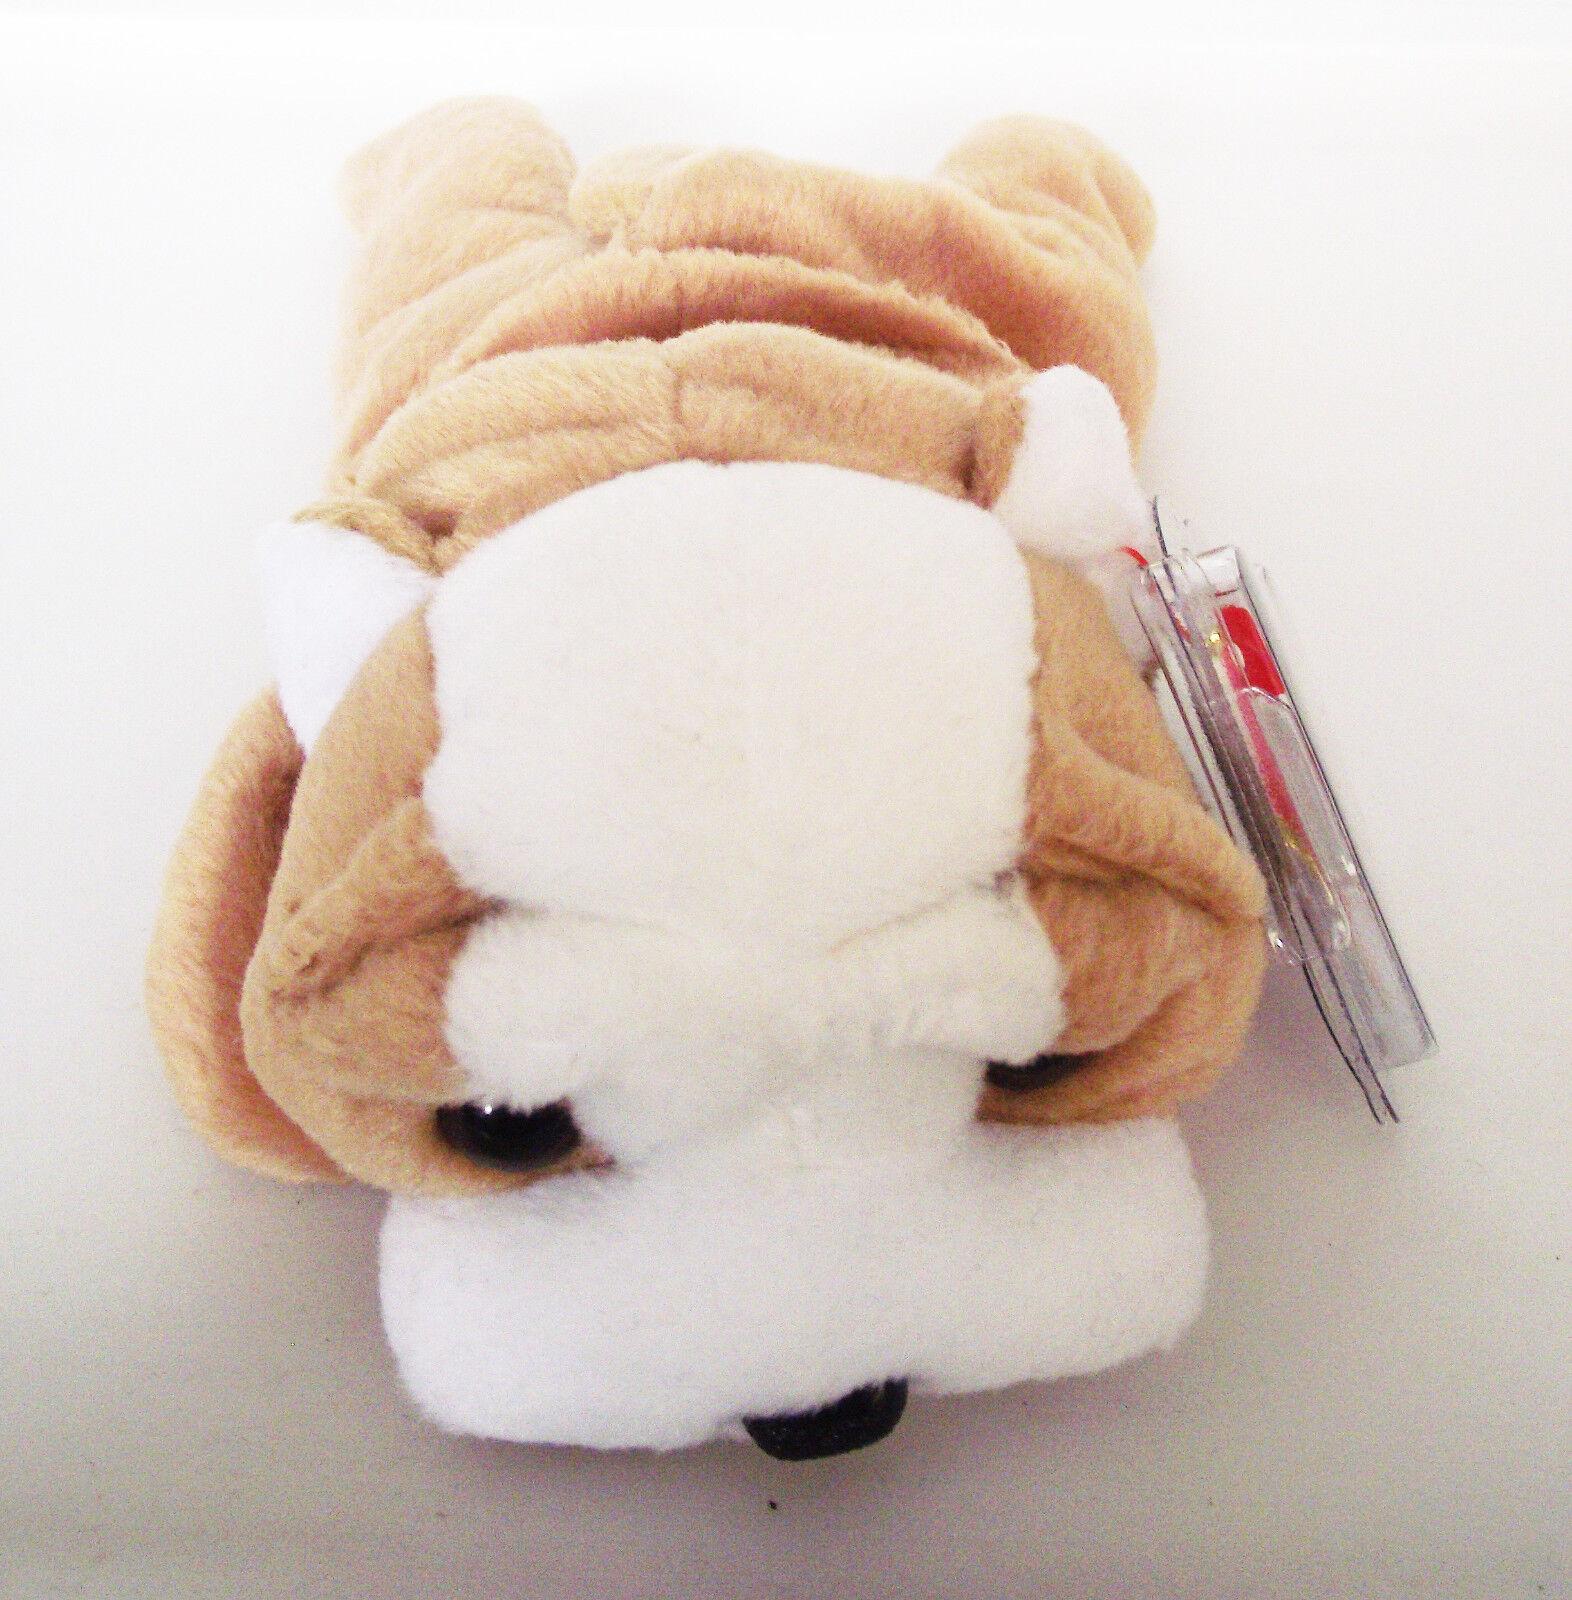 TY BEANIE BABY WRINKLES DOG ERRORS PVC 5TH GEN SWING 6TH TUSH RETIRED MINT NEW